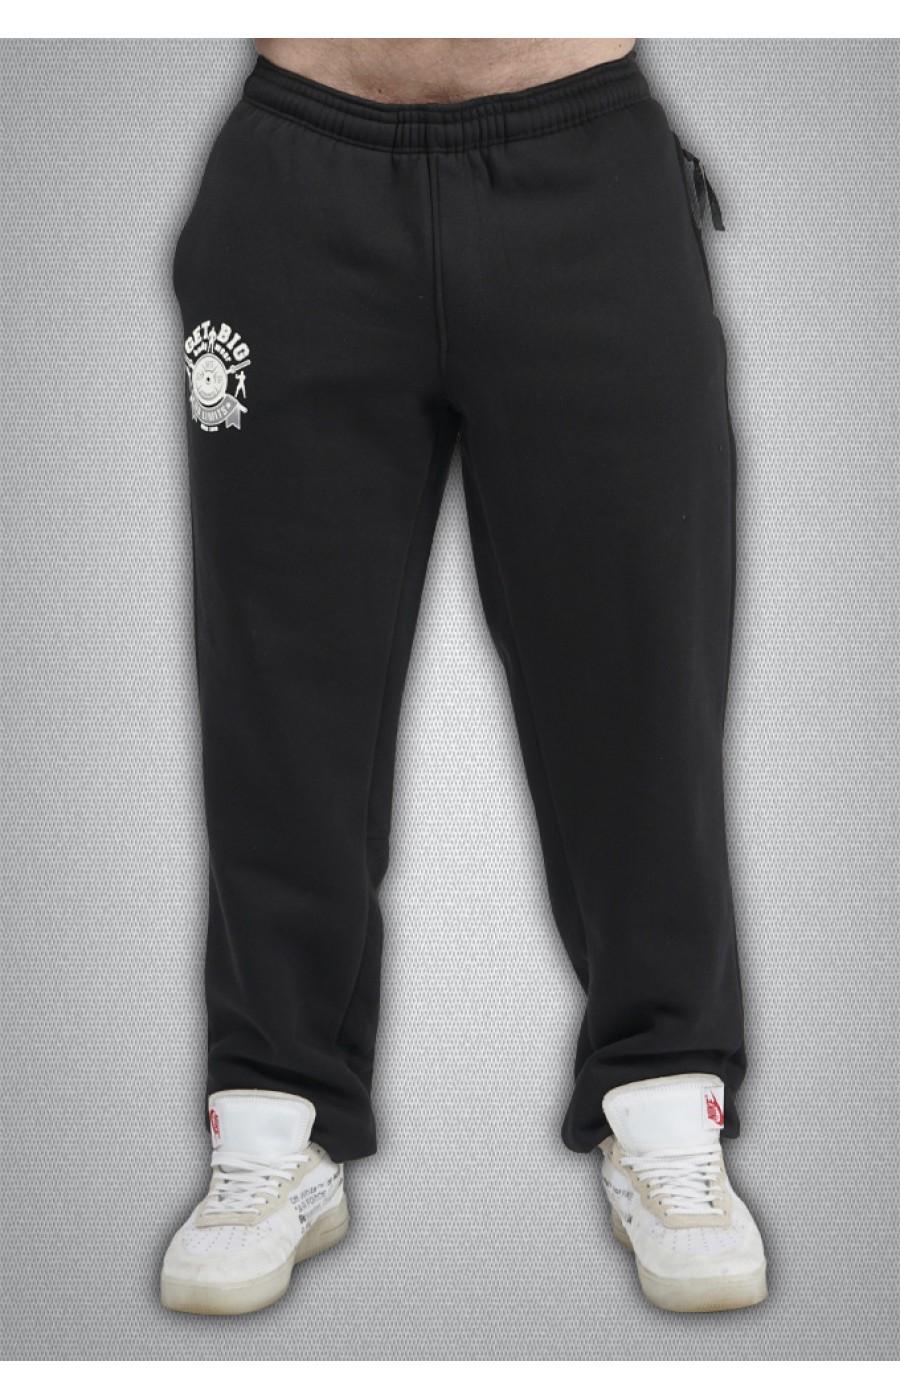 Штаны 1656 (черные)